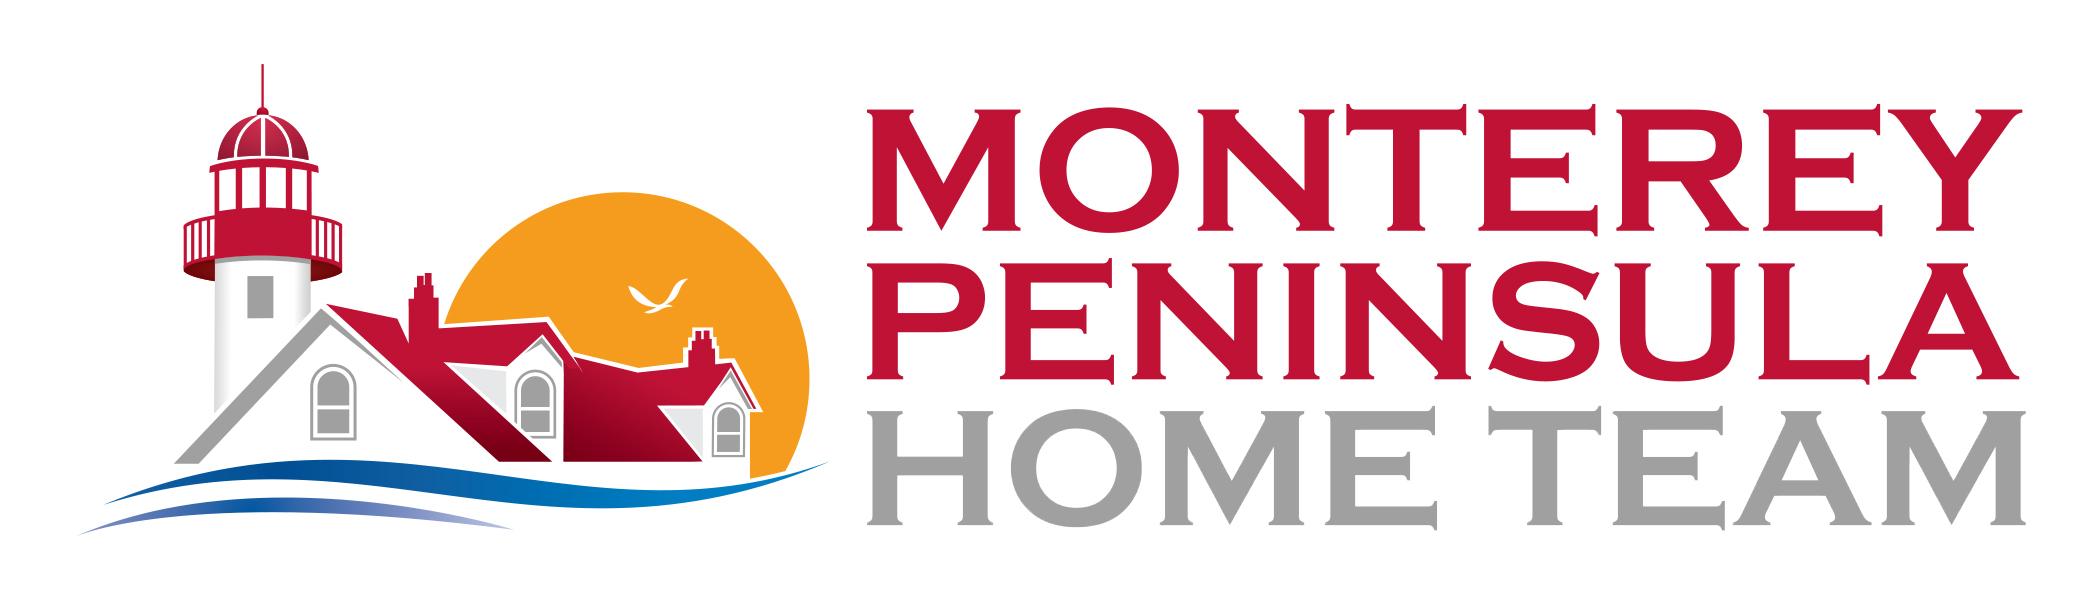 Coldwell Banker Monterey Peninsula Home Team Logo